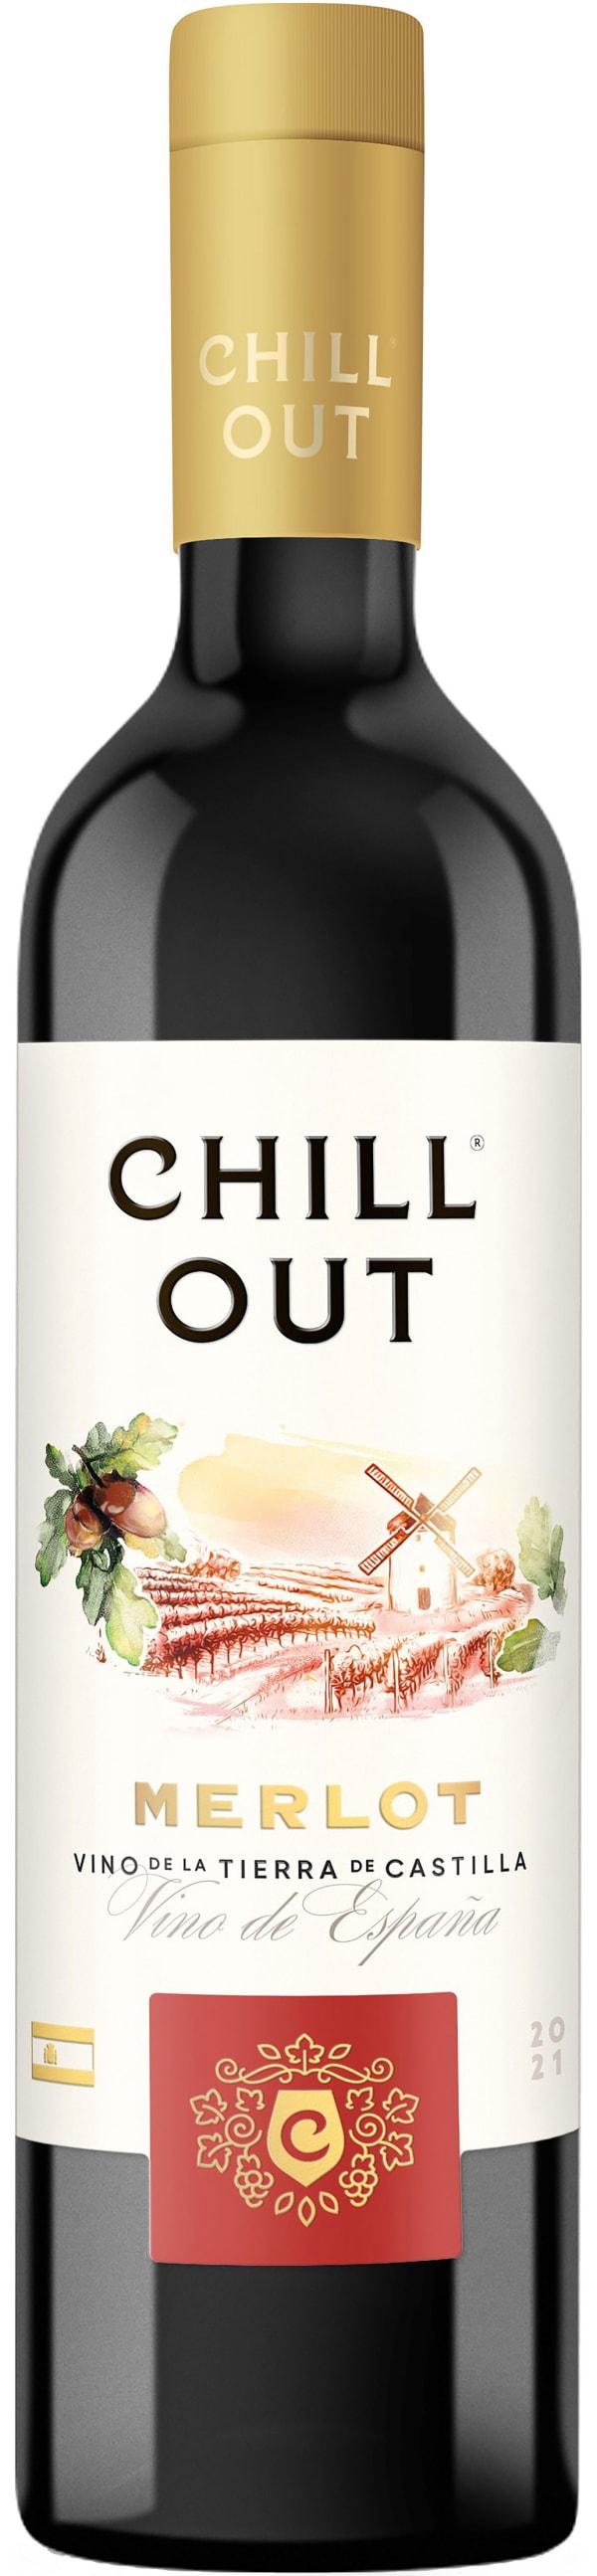 Chill Out Soft & Vibrant Merlot 2015 plastic bottle